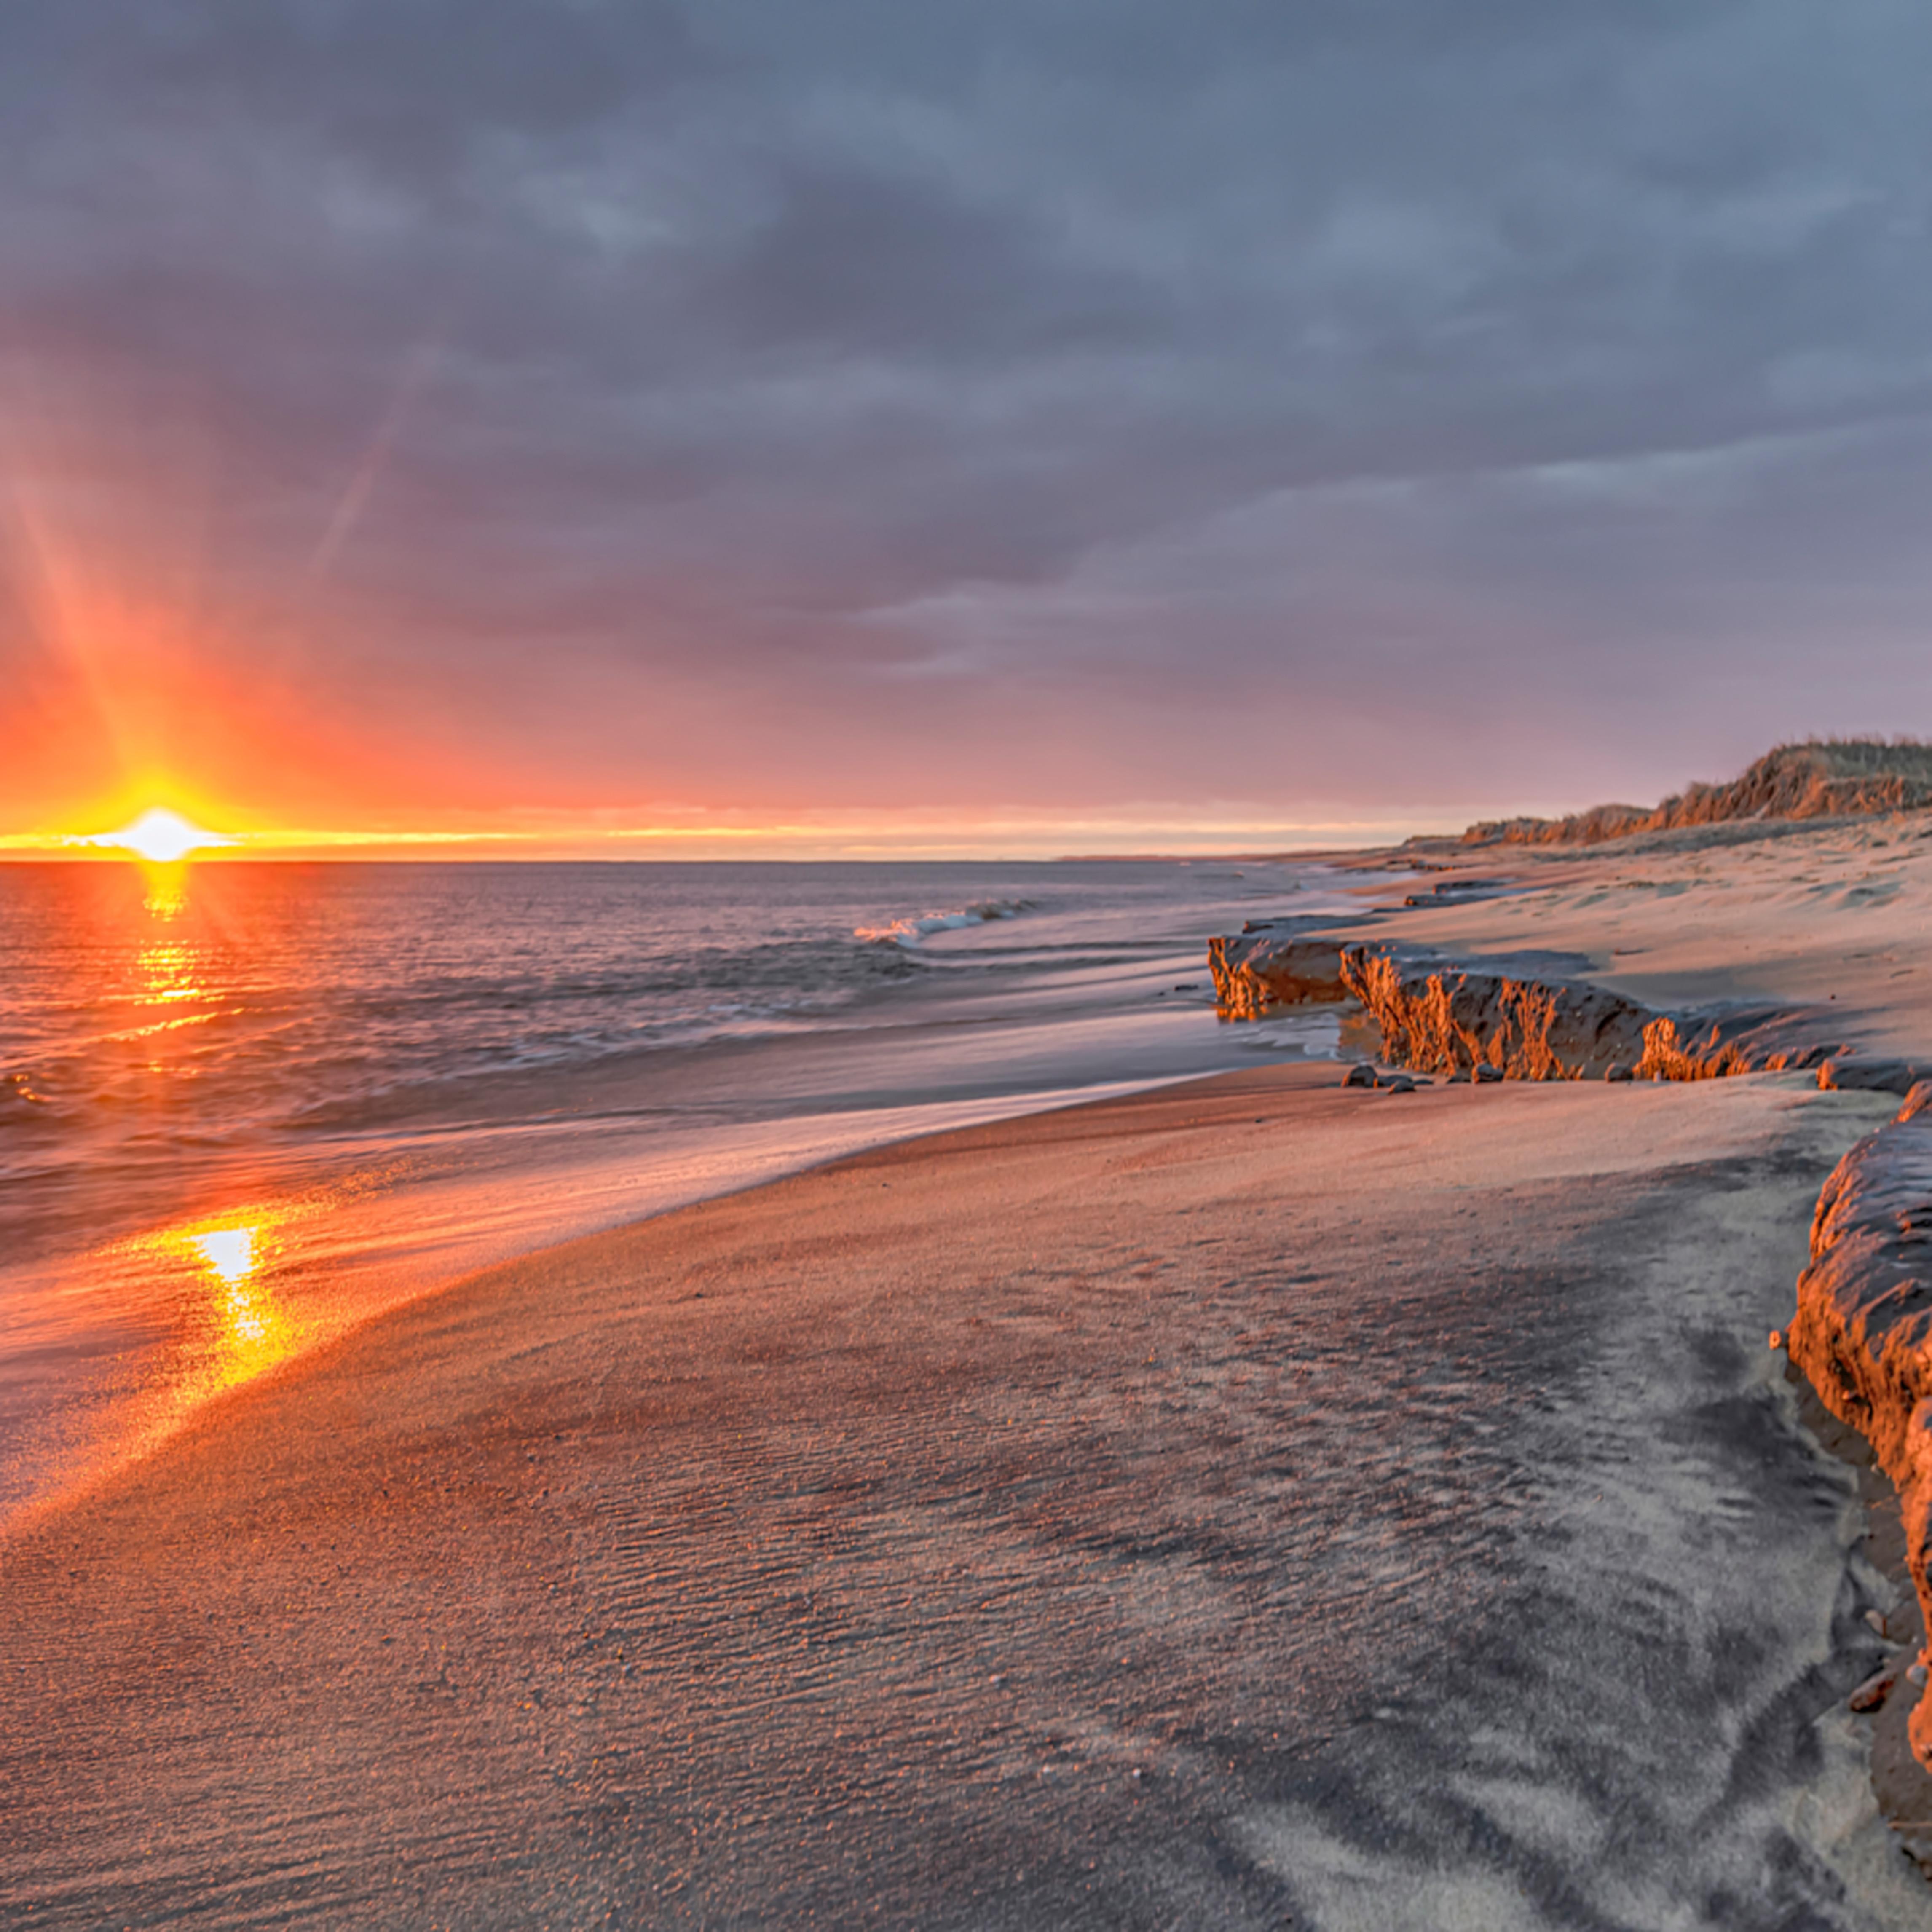 South beach winter sun 1 gpjp3c